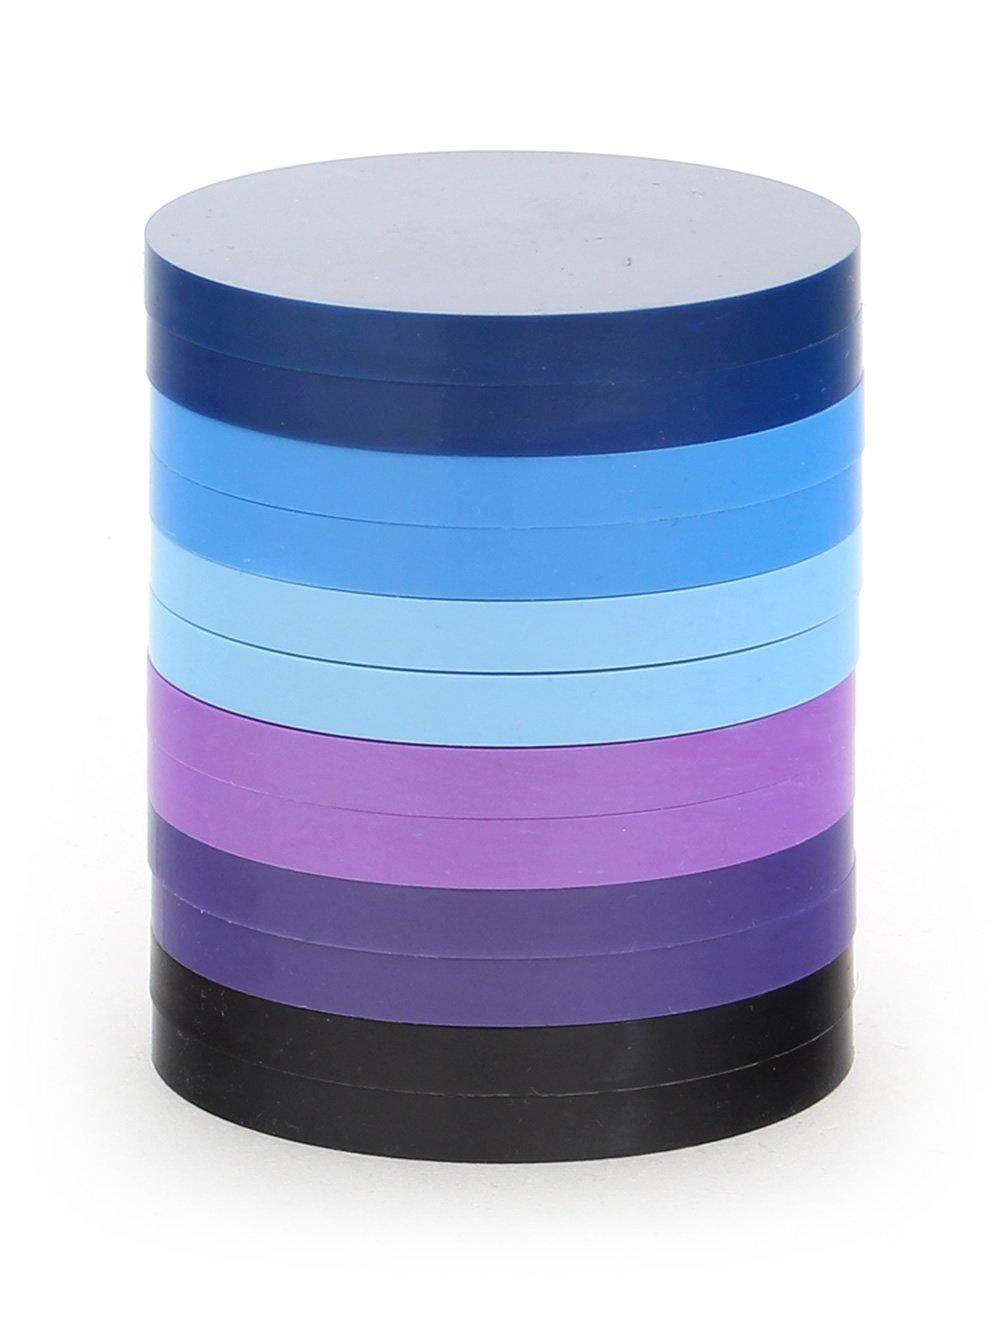 Alea Tools 2-Inch Magnetic Status Markers - Blue / Purple - 12-Pack